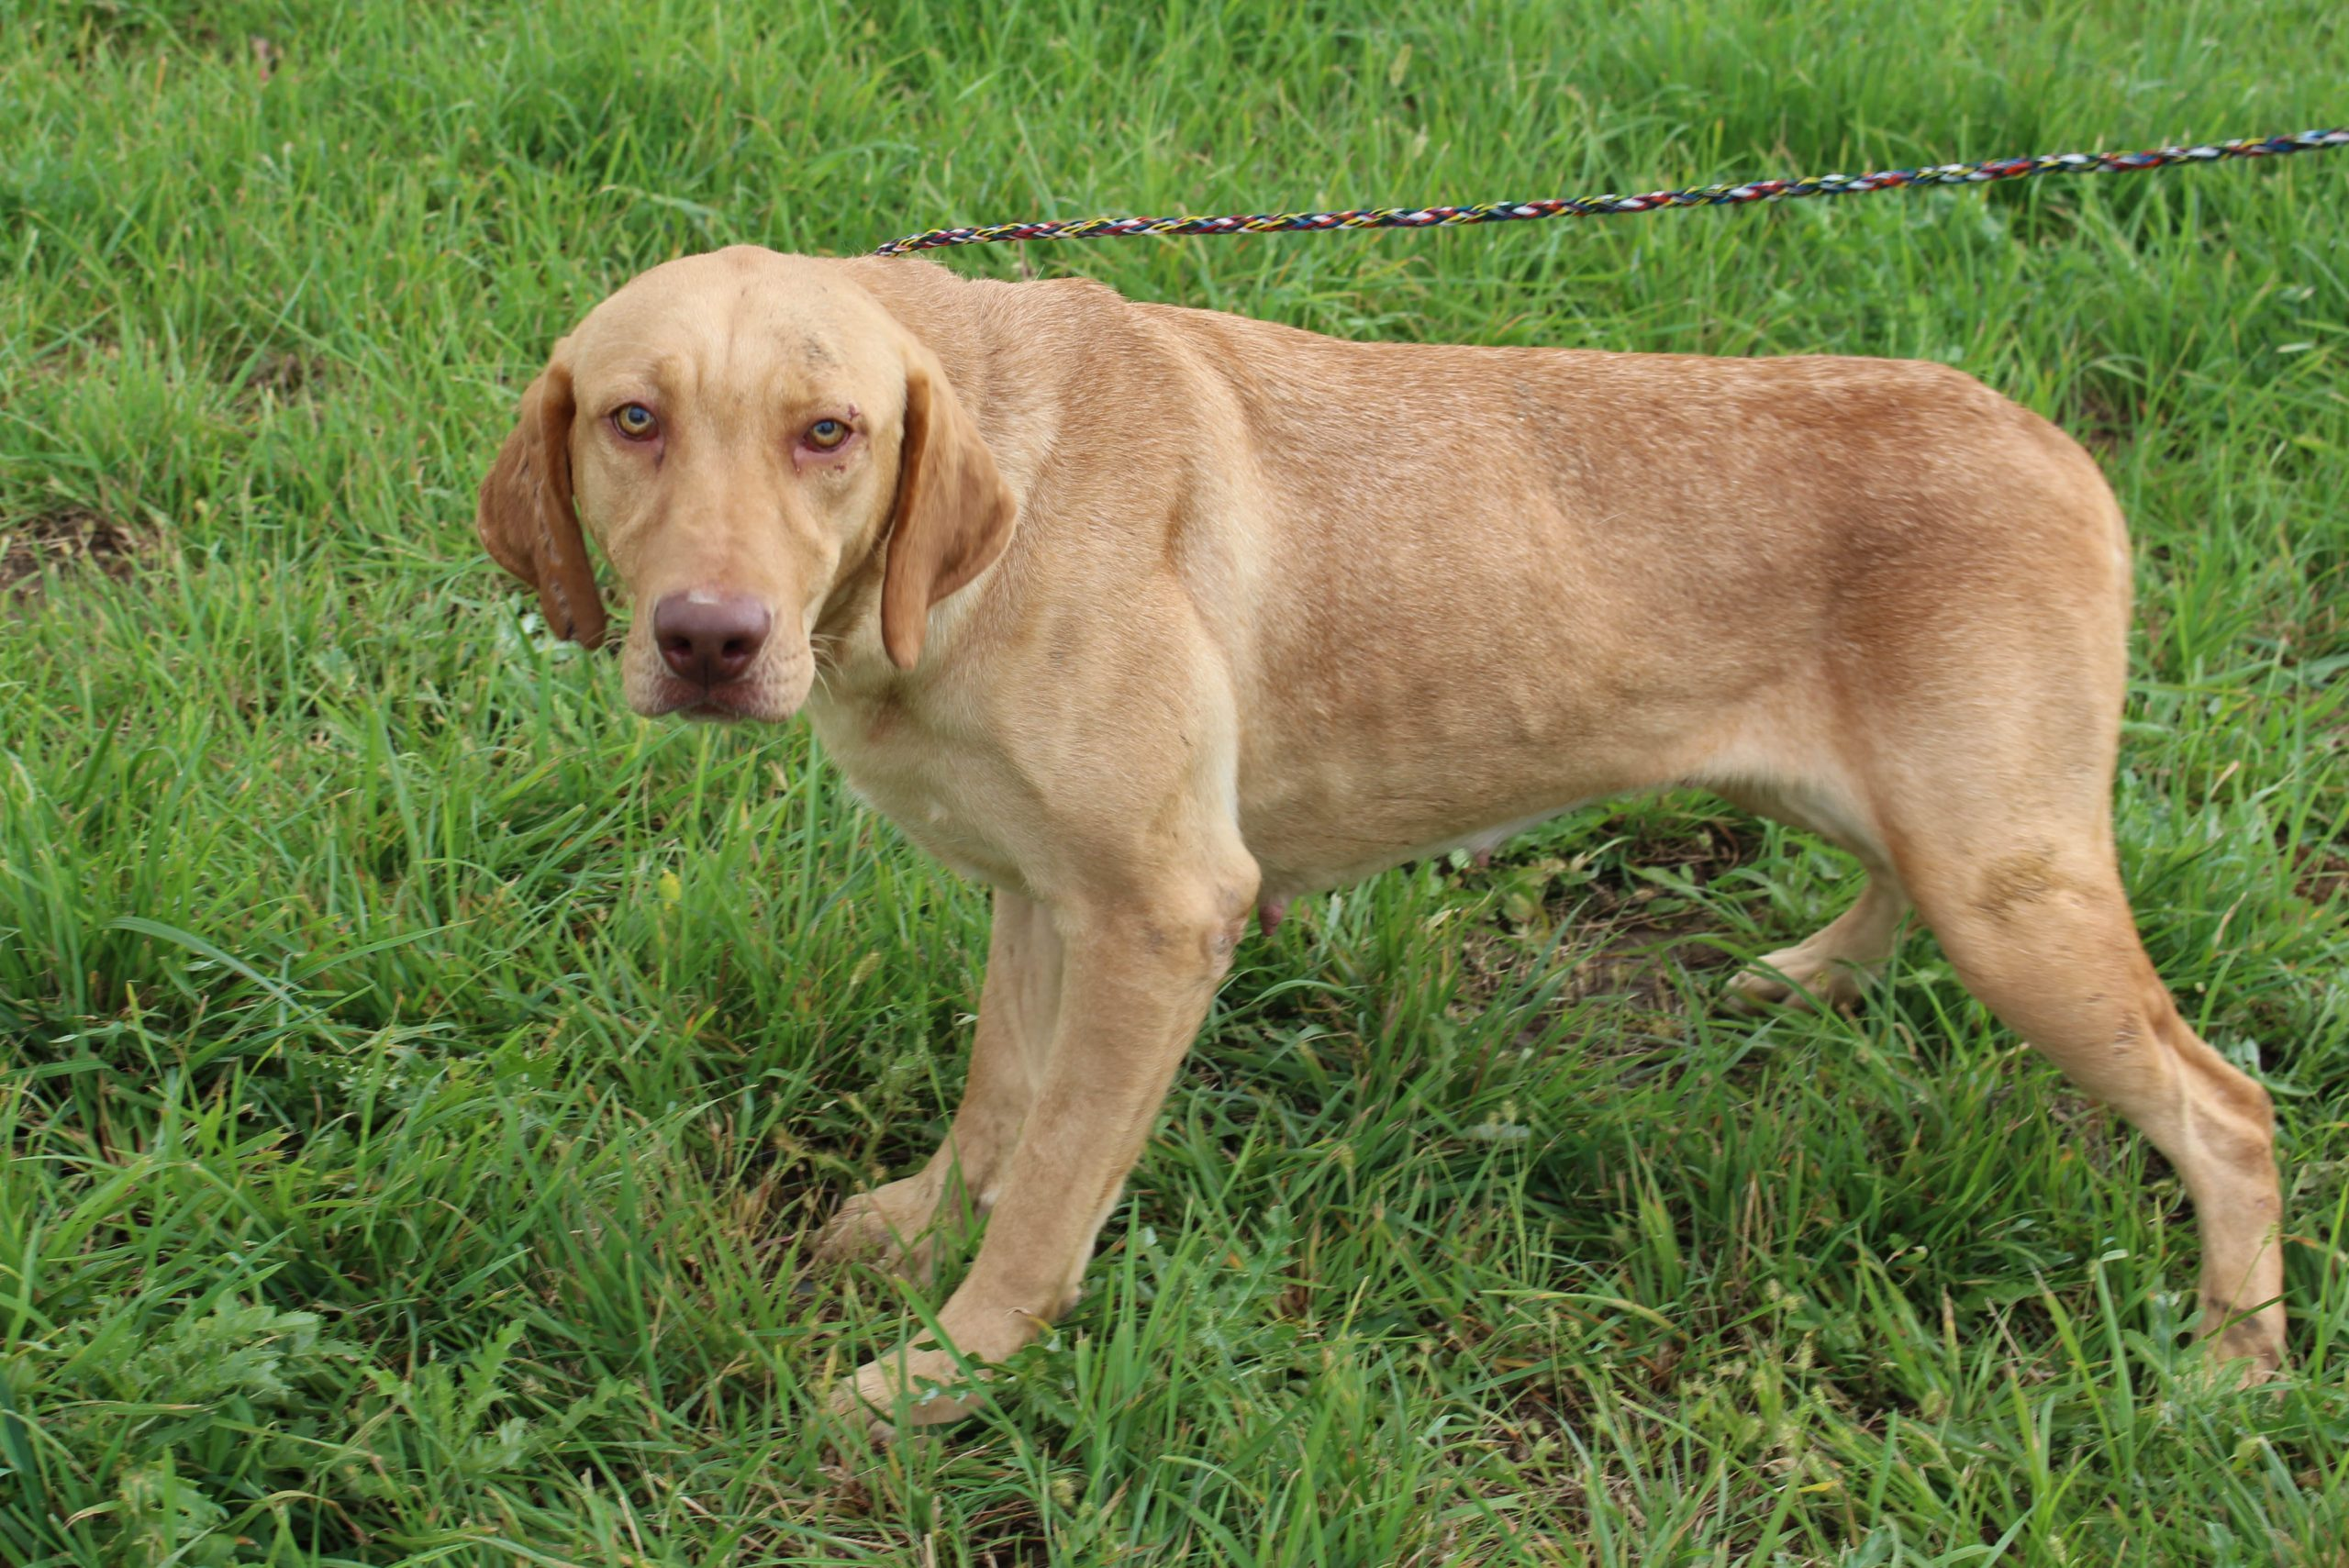 Queenie - AKC Labrador Retriever female doggie for sale near Spencerville, Indiana